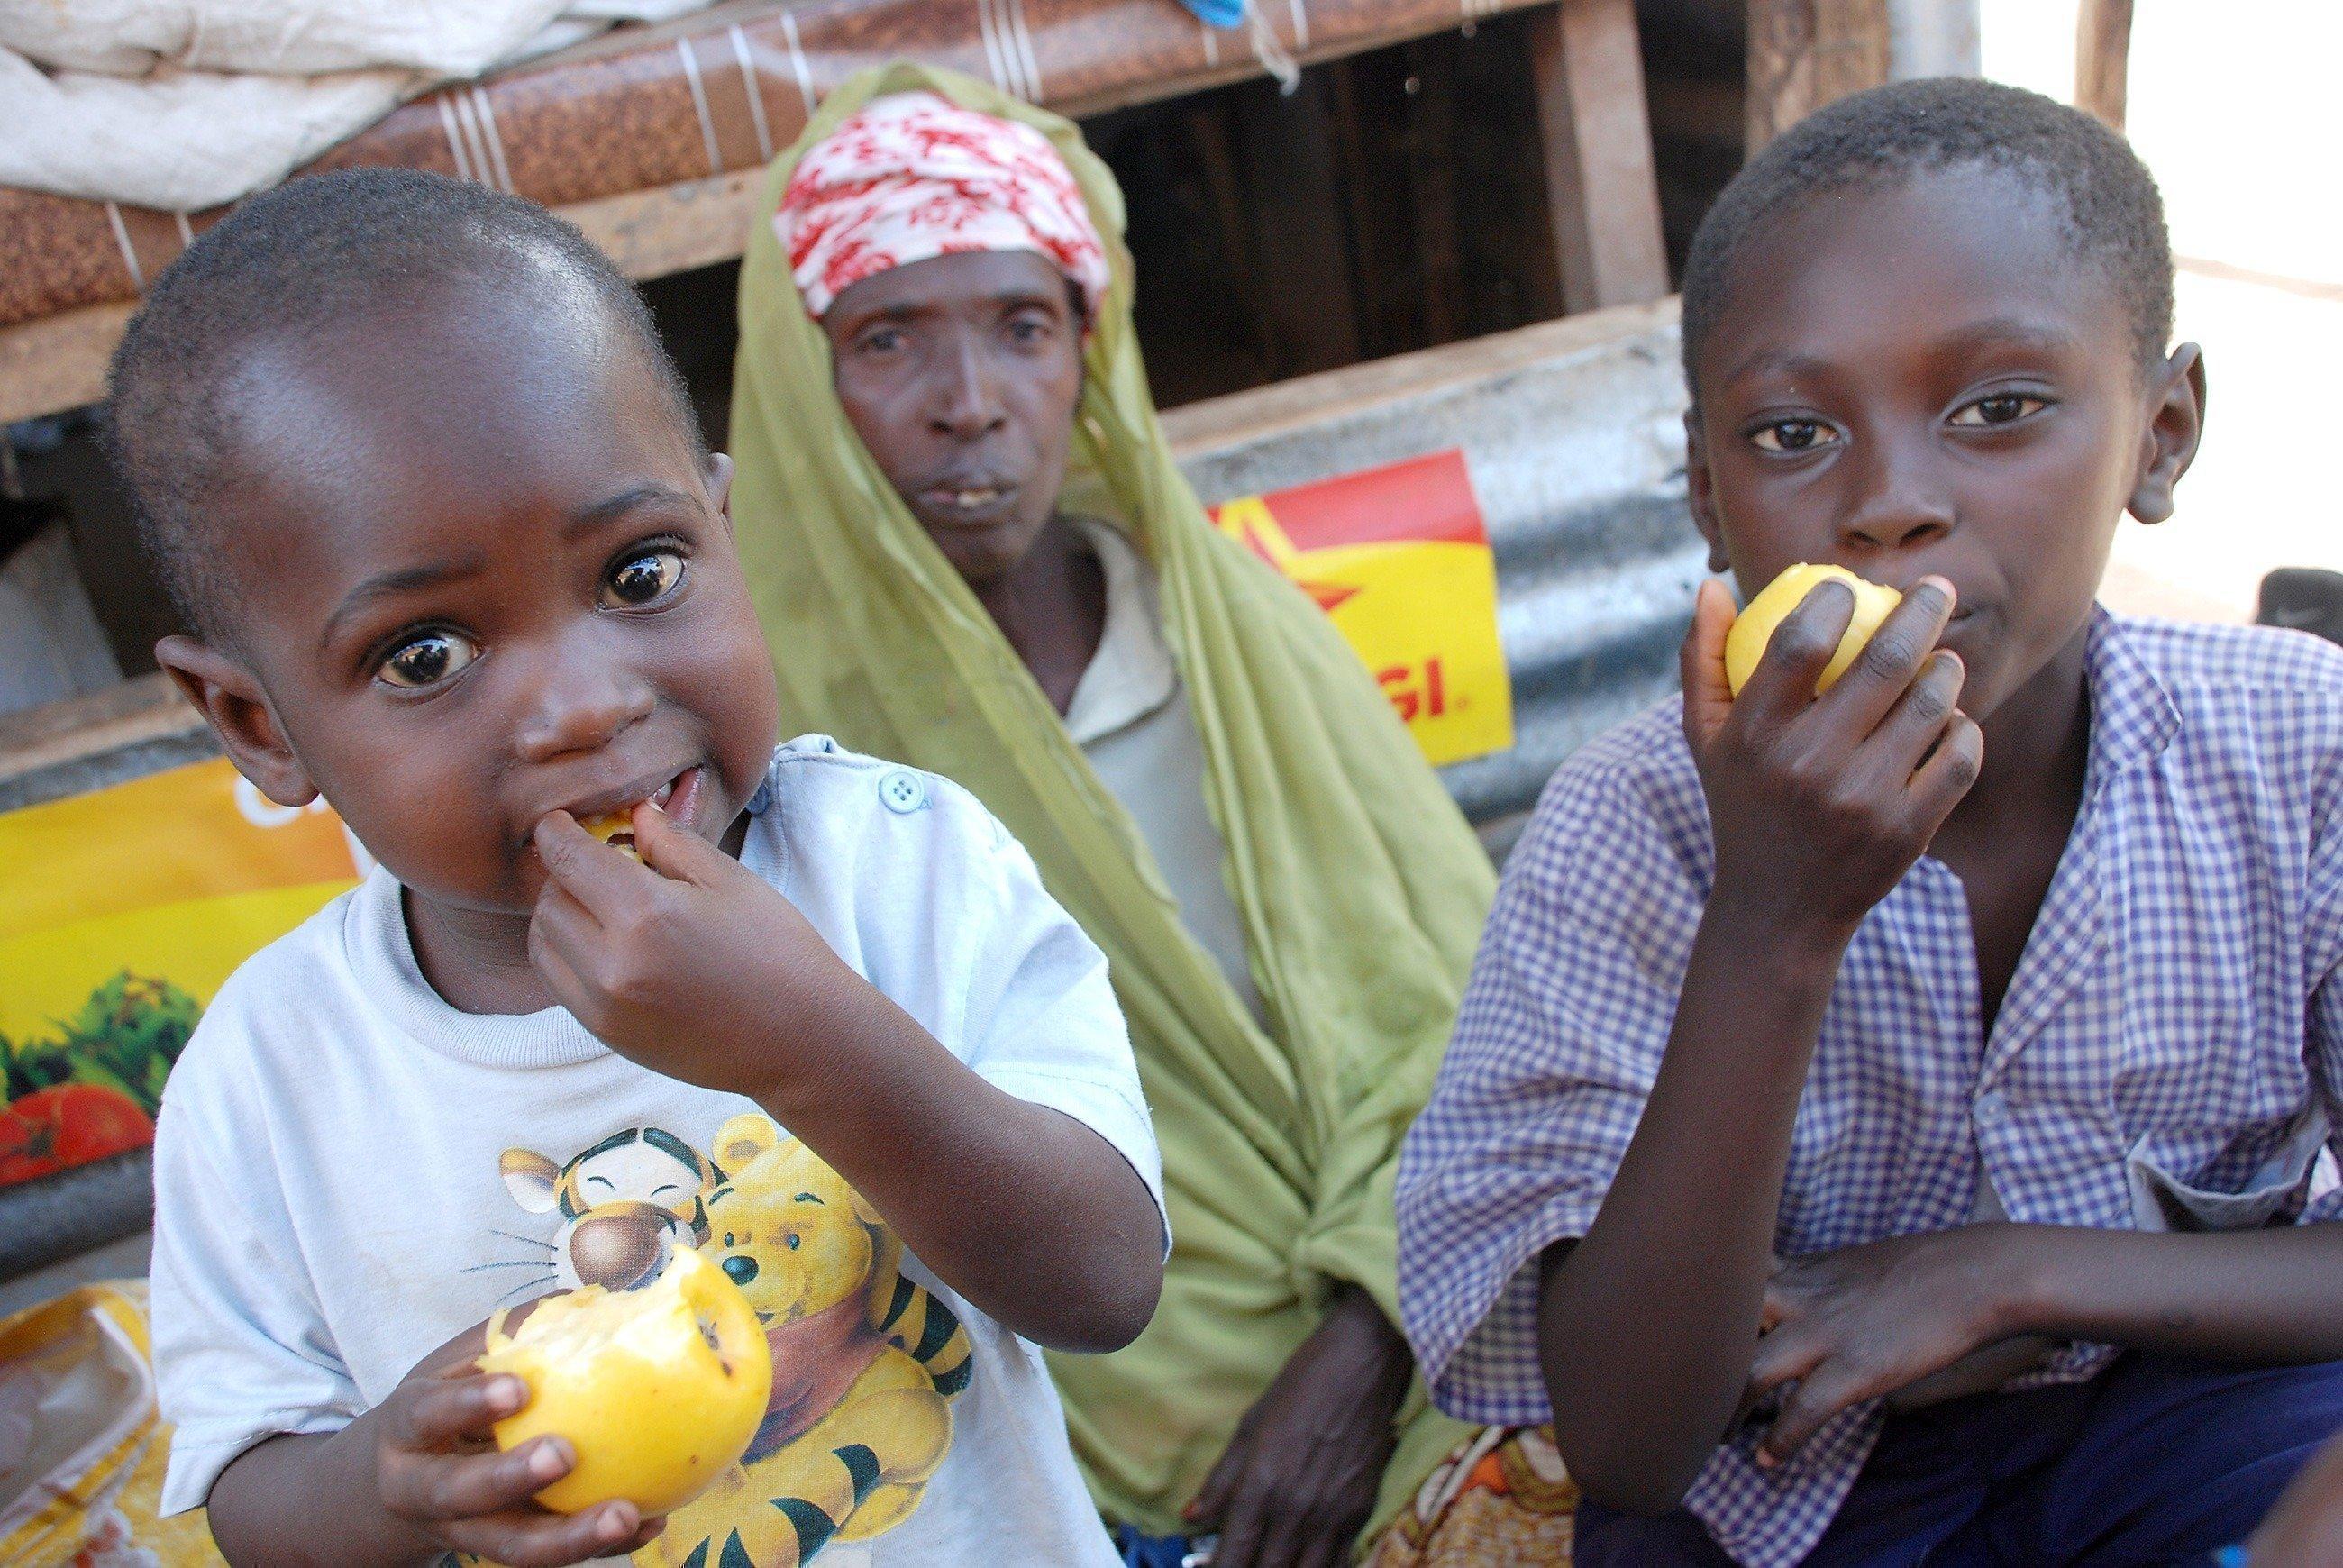 Afrikanische Kinder essen Äpfel.